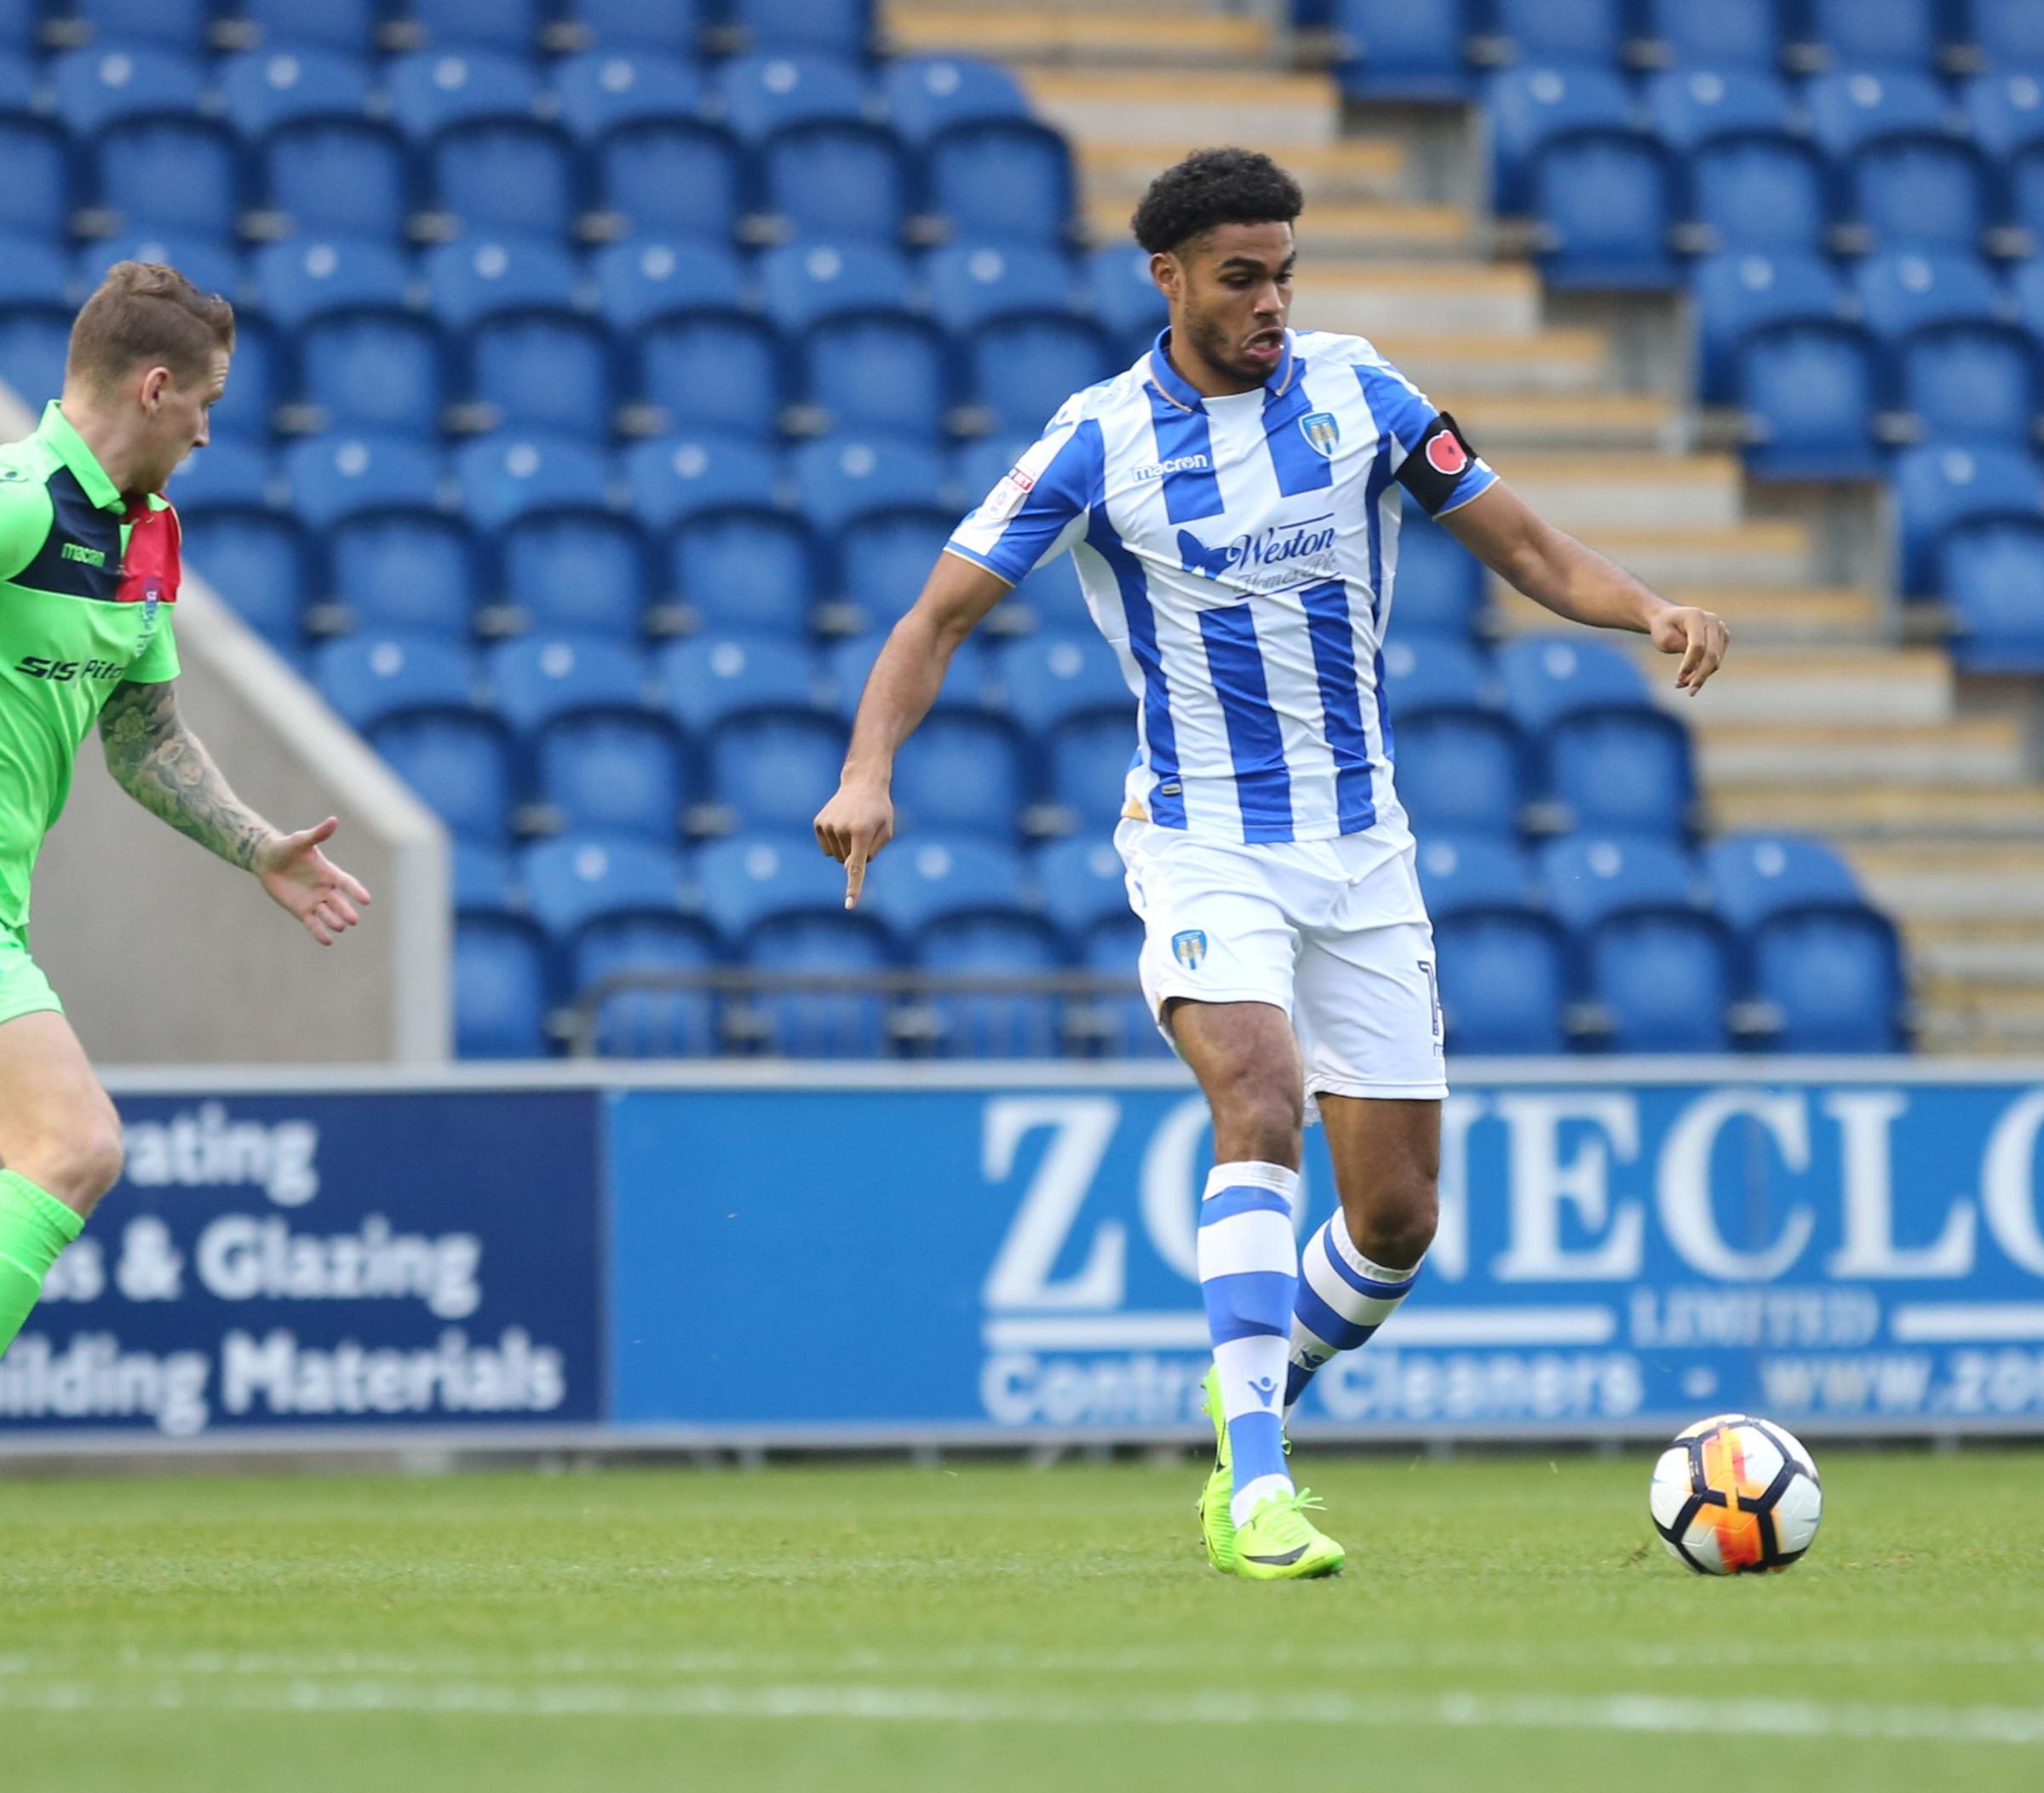 Colchester United striker Mikael Mandron feels like he is finding best form | Gazette